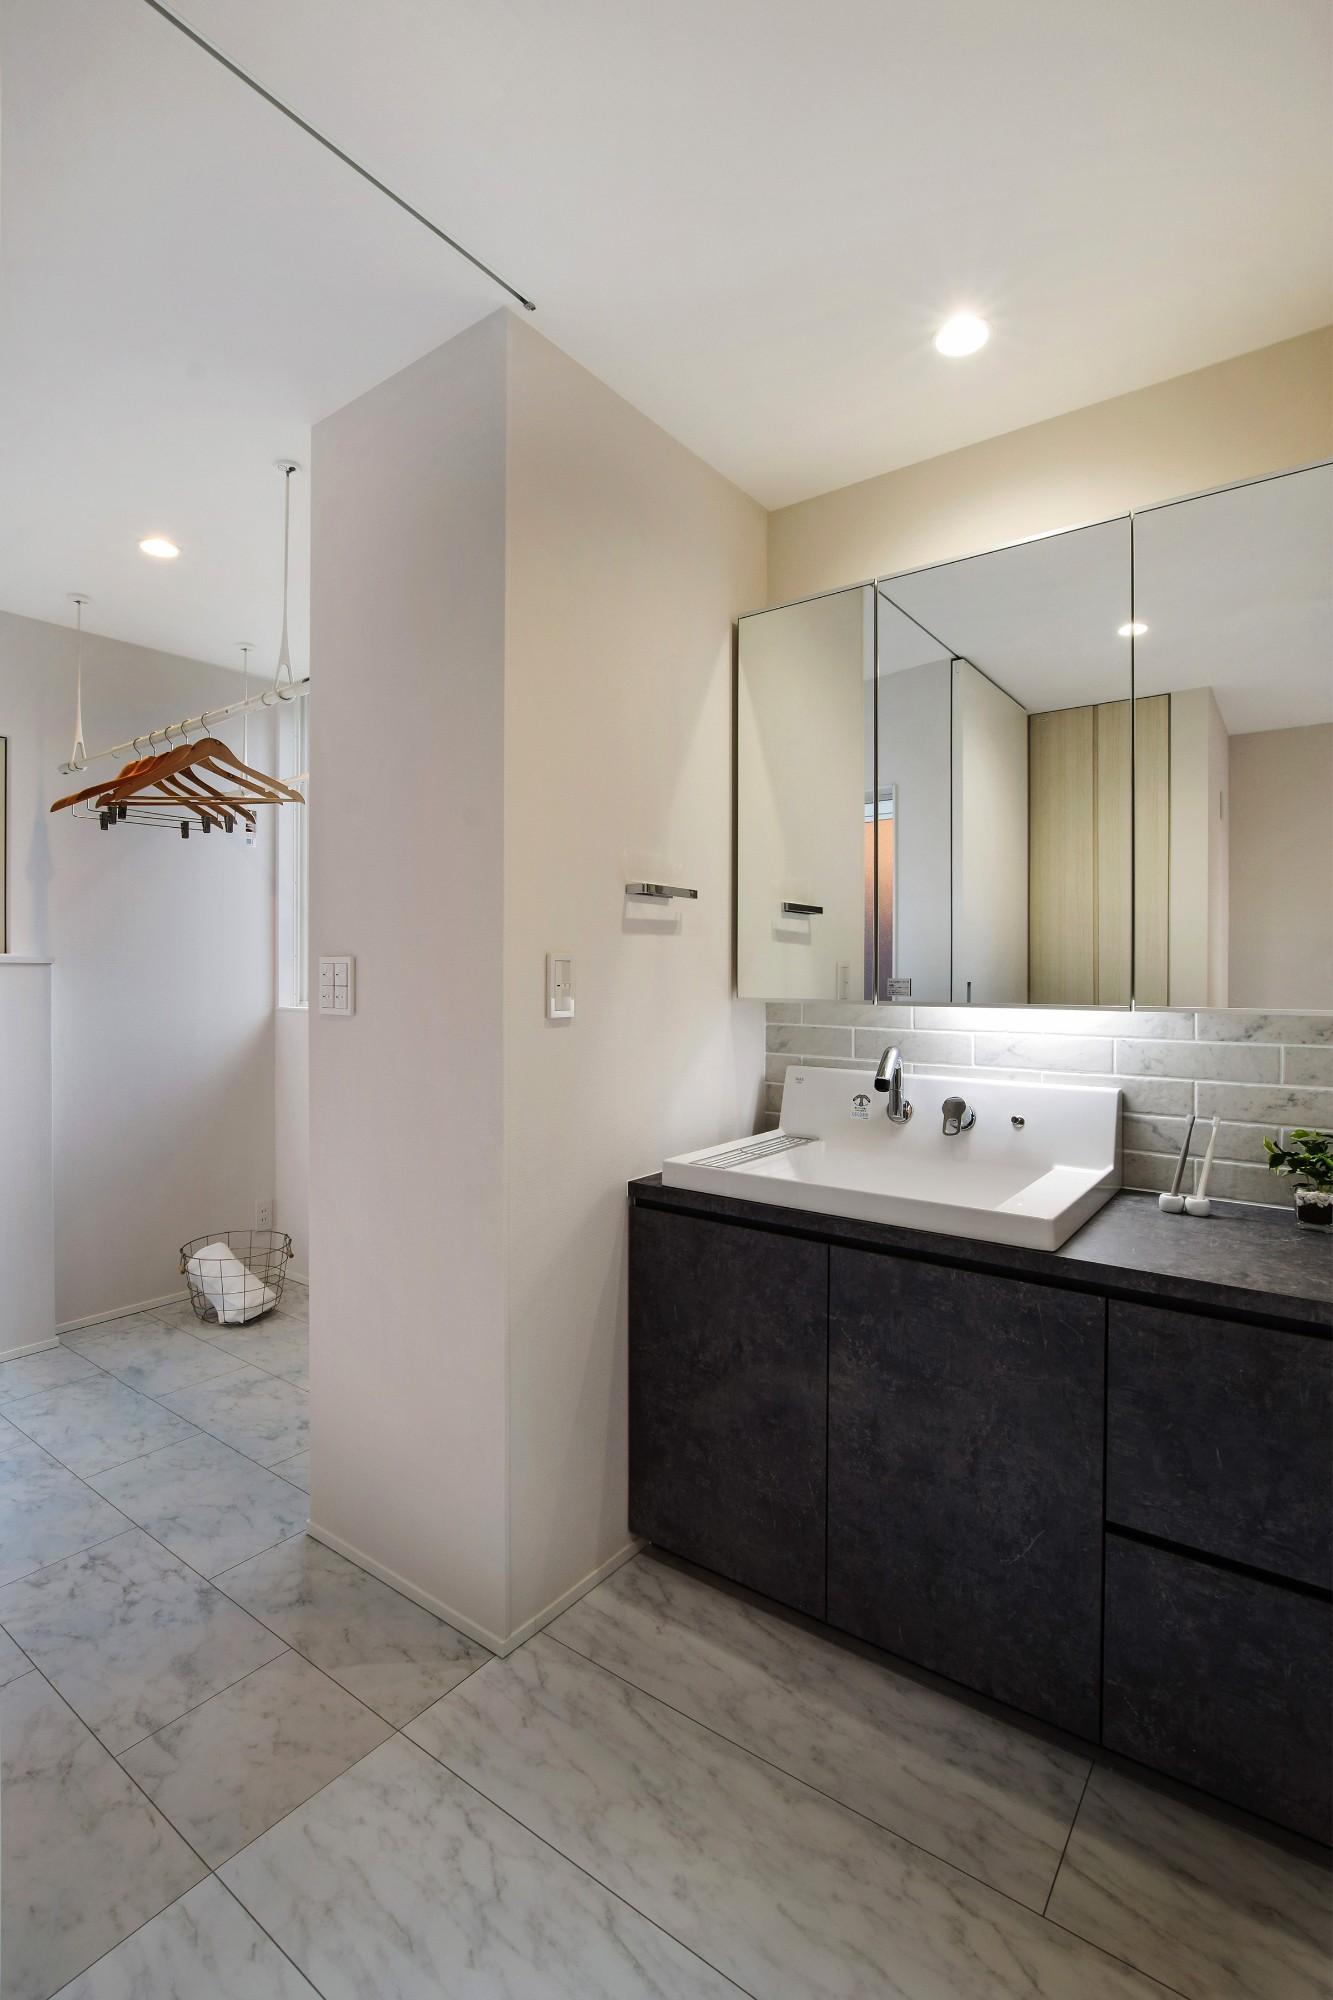 DETAIL HOME(ディテールホーム)「40代からのワンフロアスタイル」のシンプル・ナチュラルな洗面所・脱衣所の実例写真